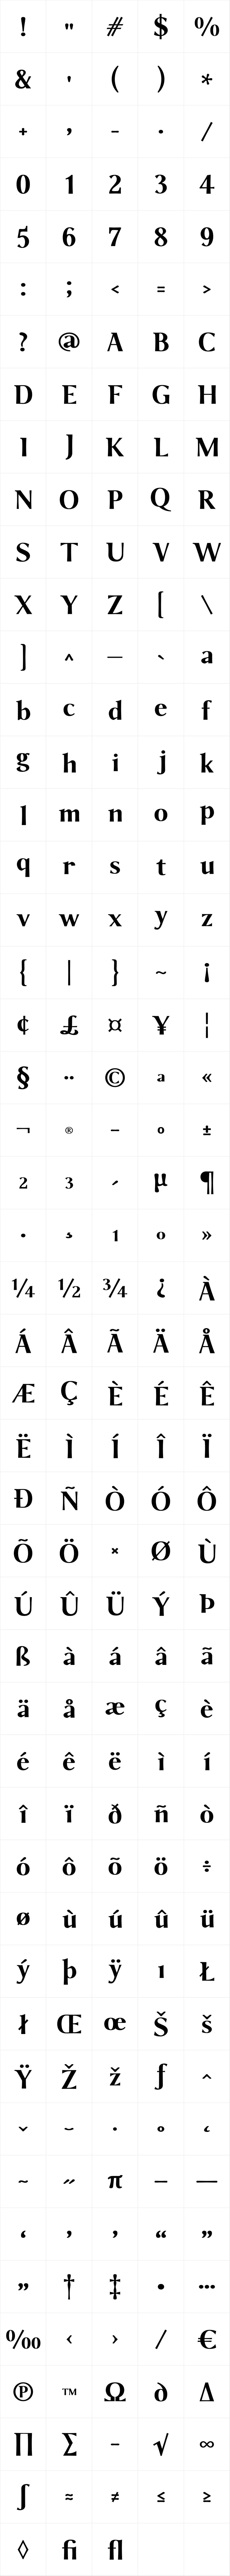 P22 Foxtrot Sans Bold